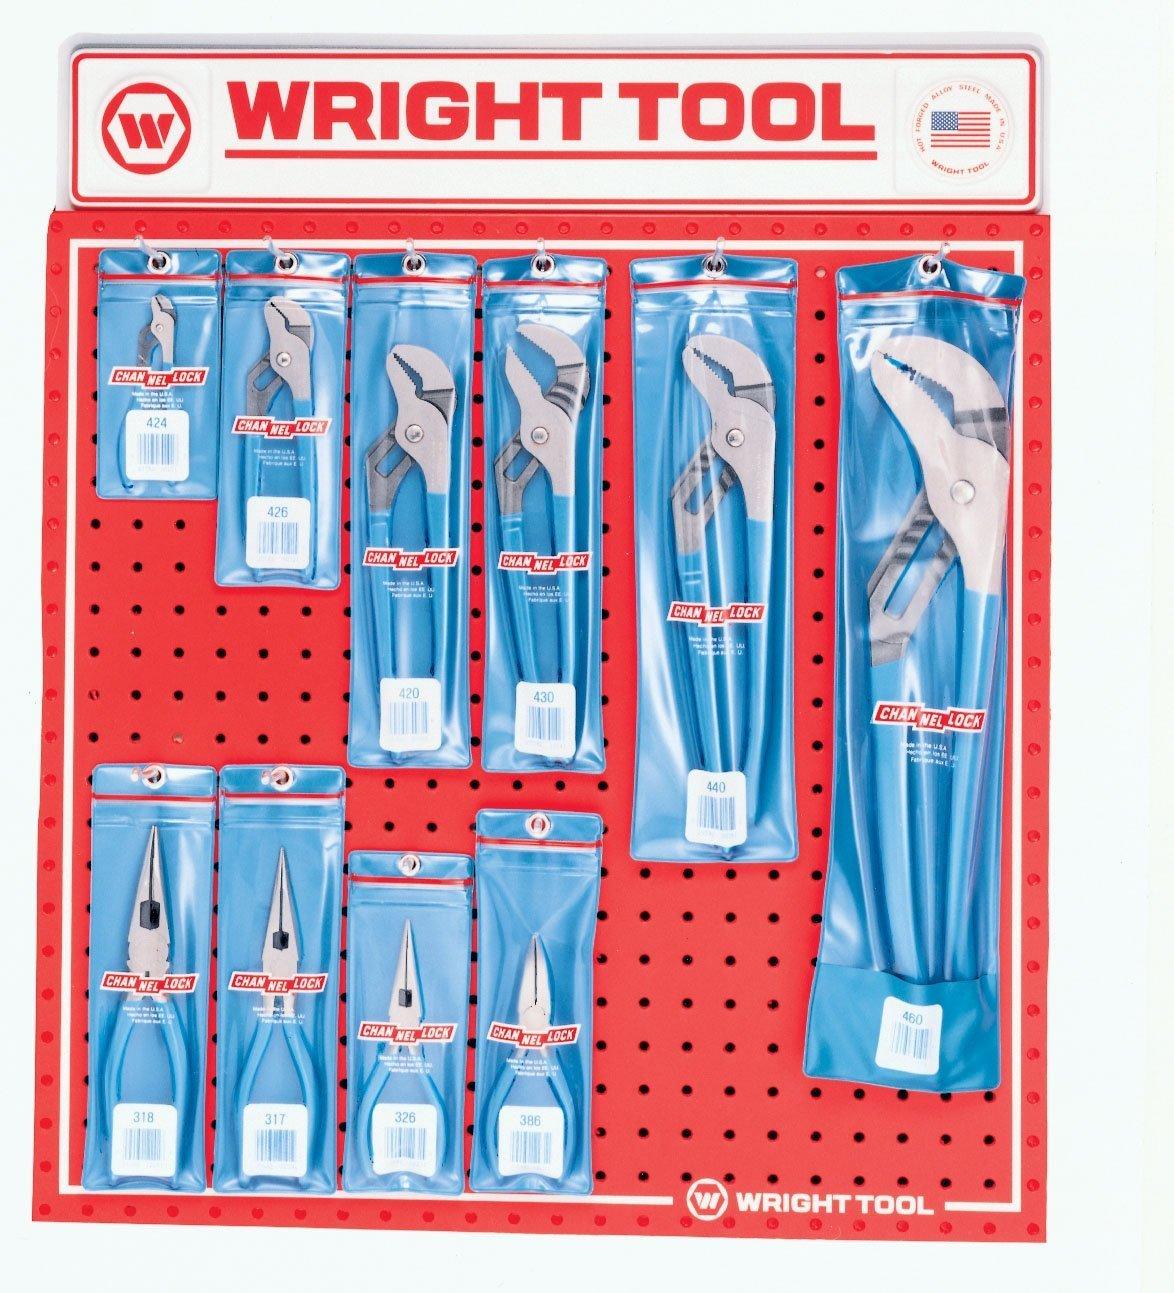 Wright Tool D969 Channel Lock Pliers, 10-Piece